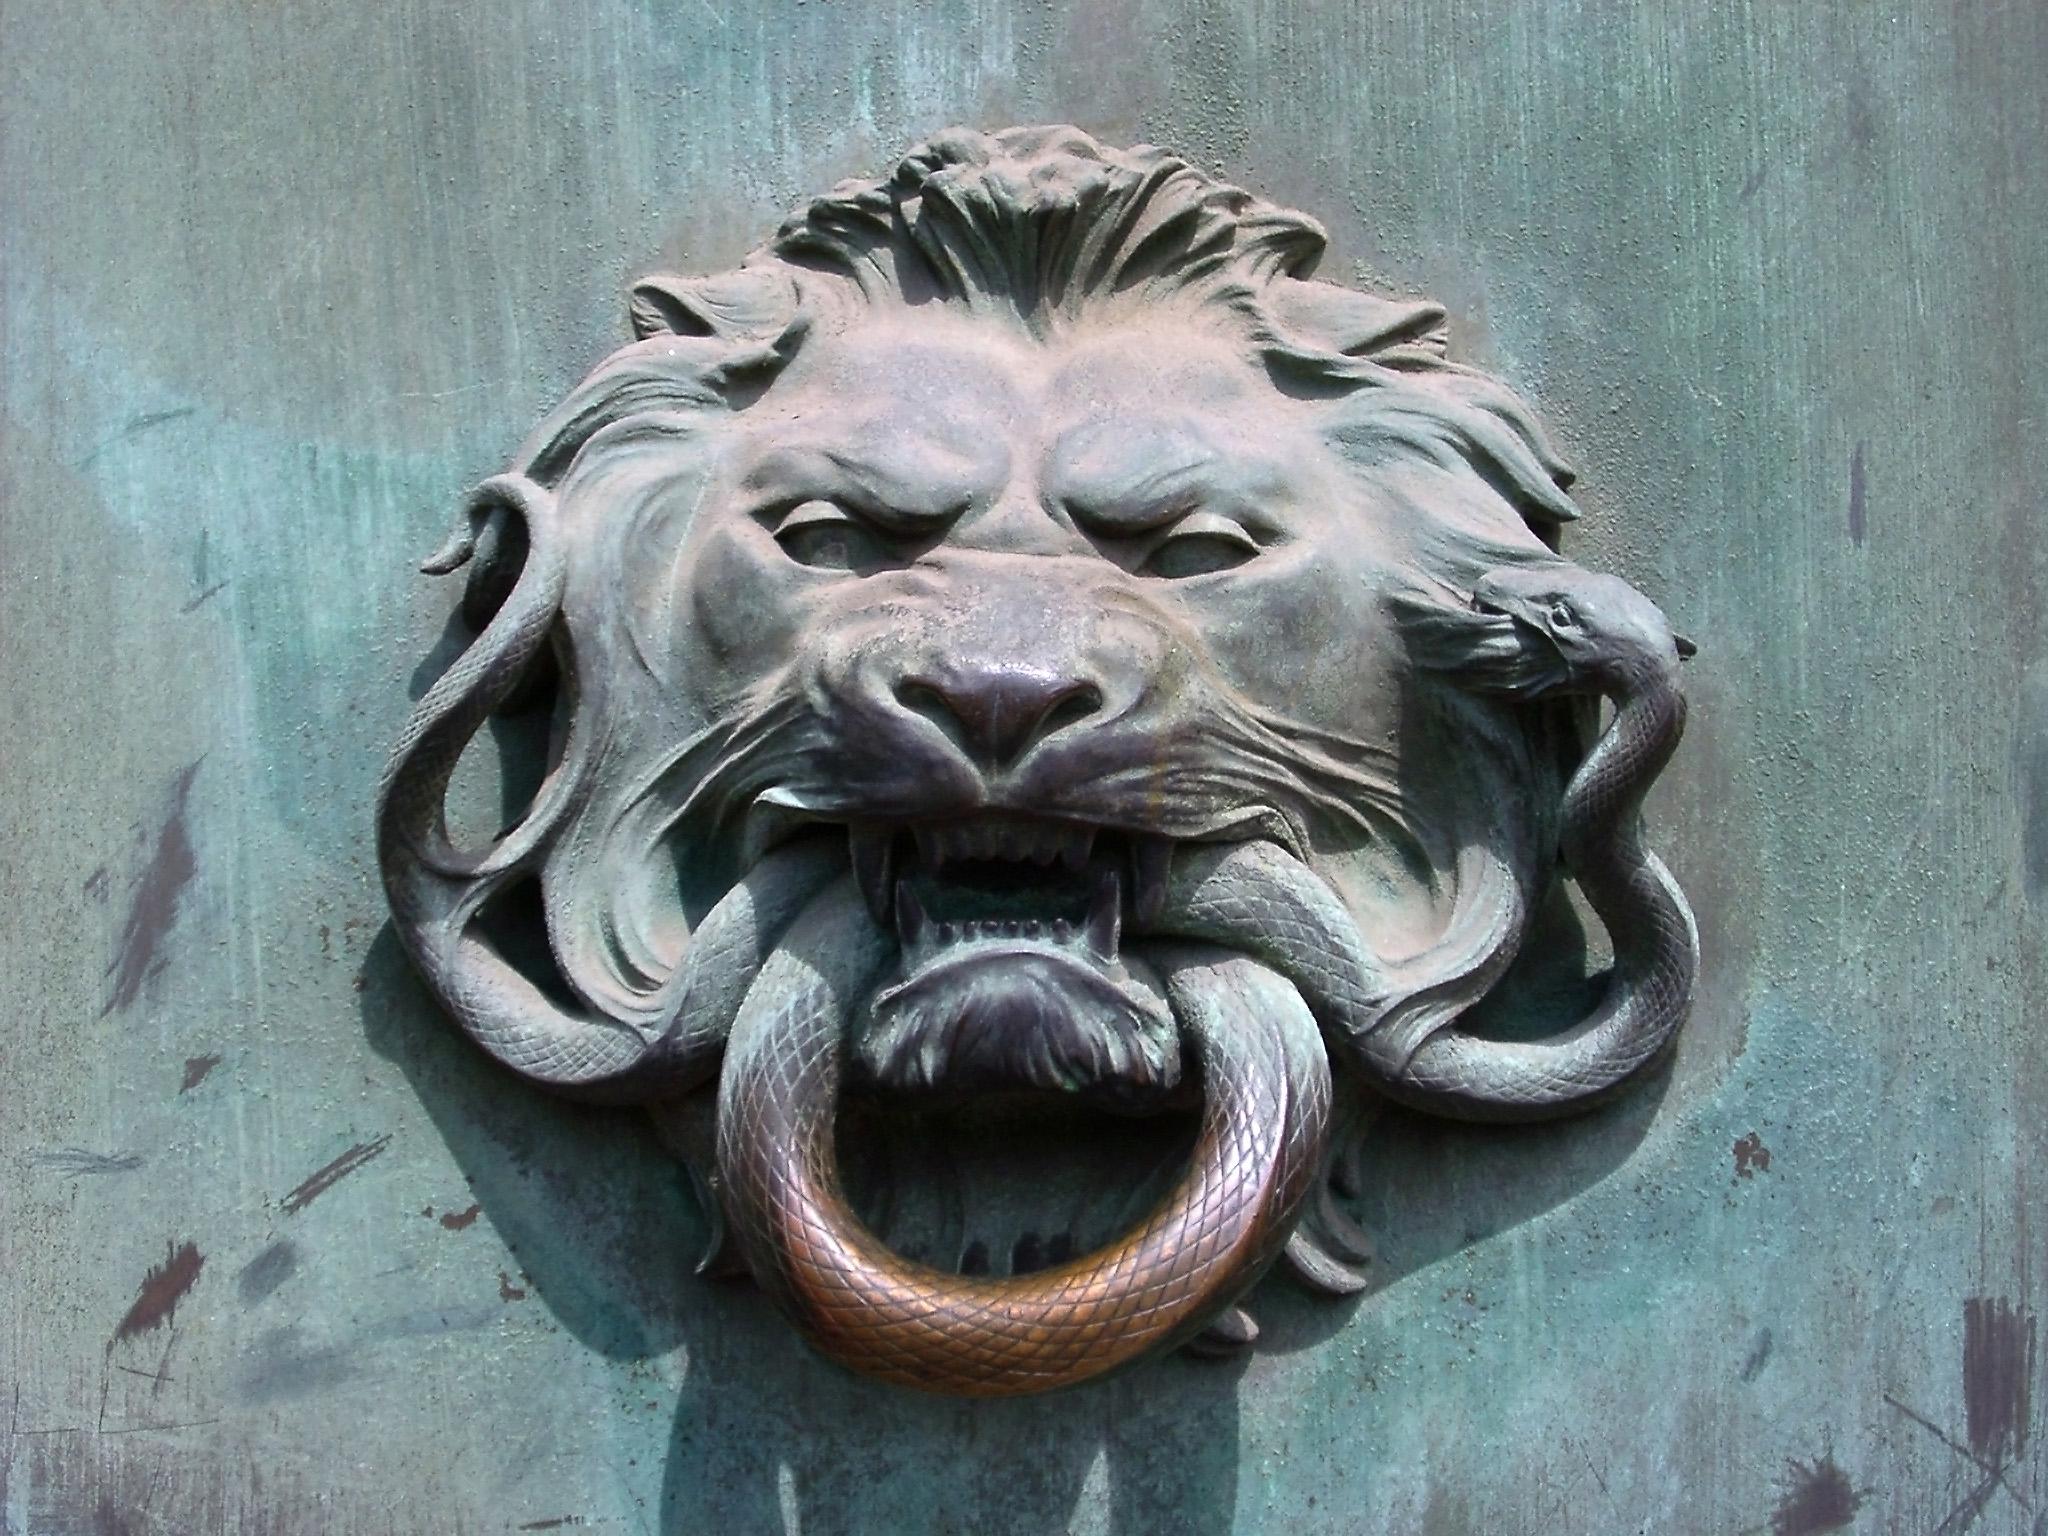 Free stock photo of door knocker of a lions head photoeverywhere - Lion face door knocker ...